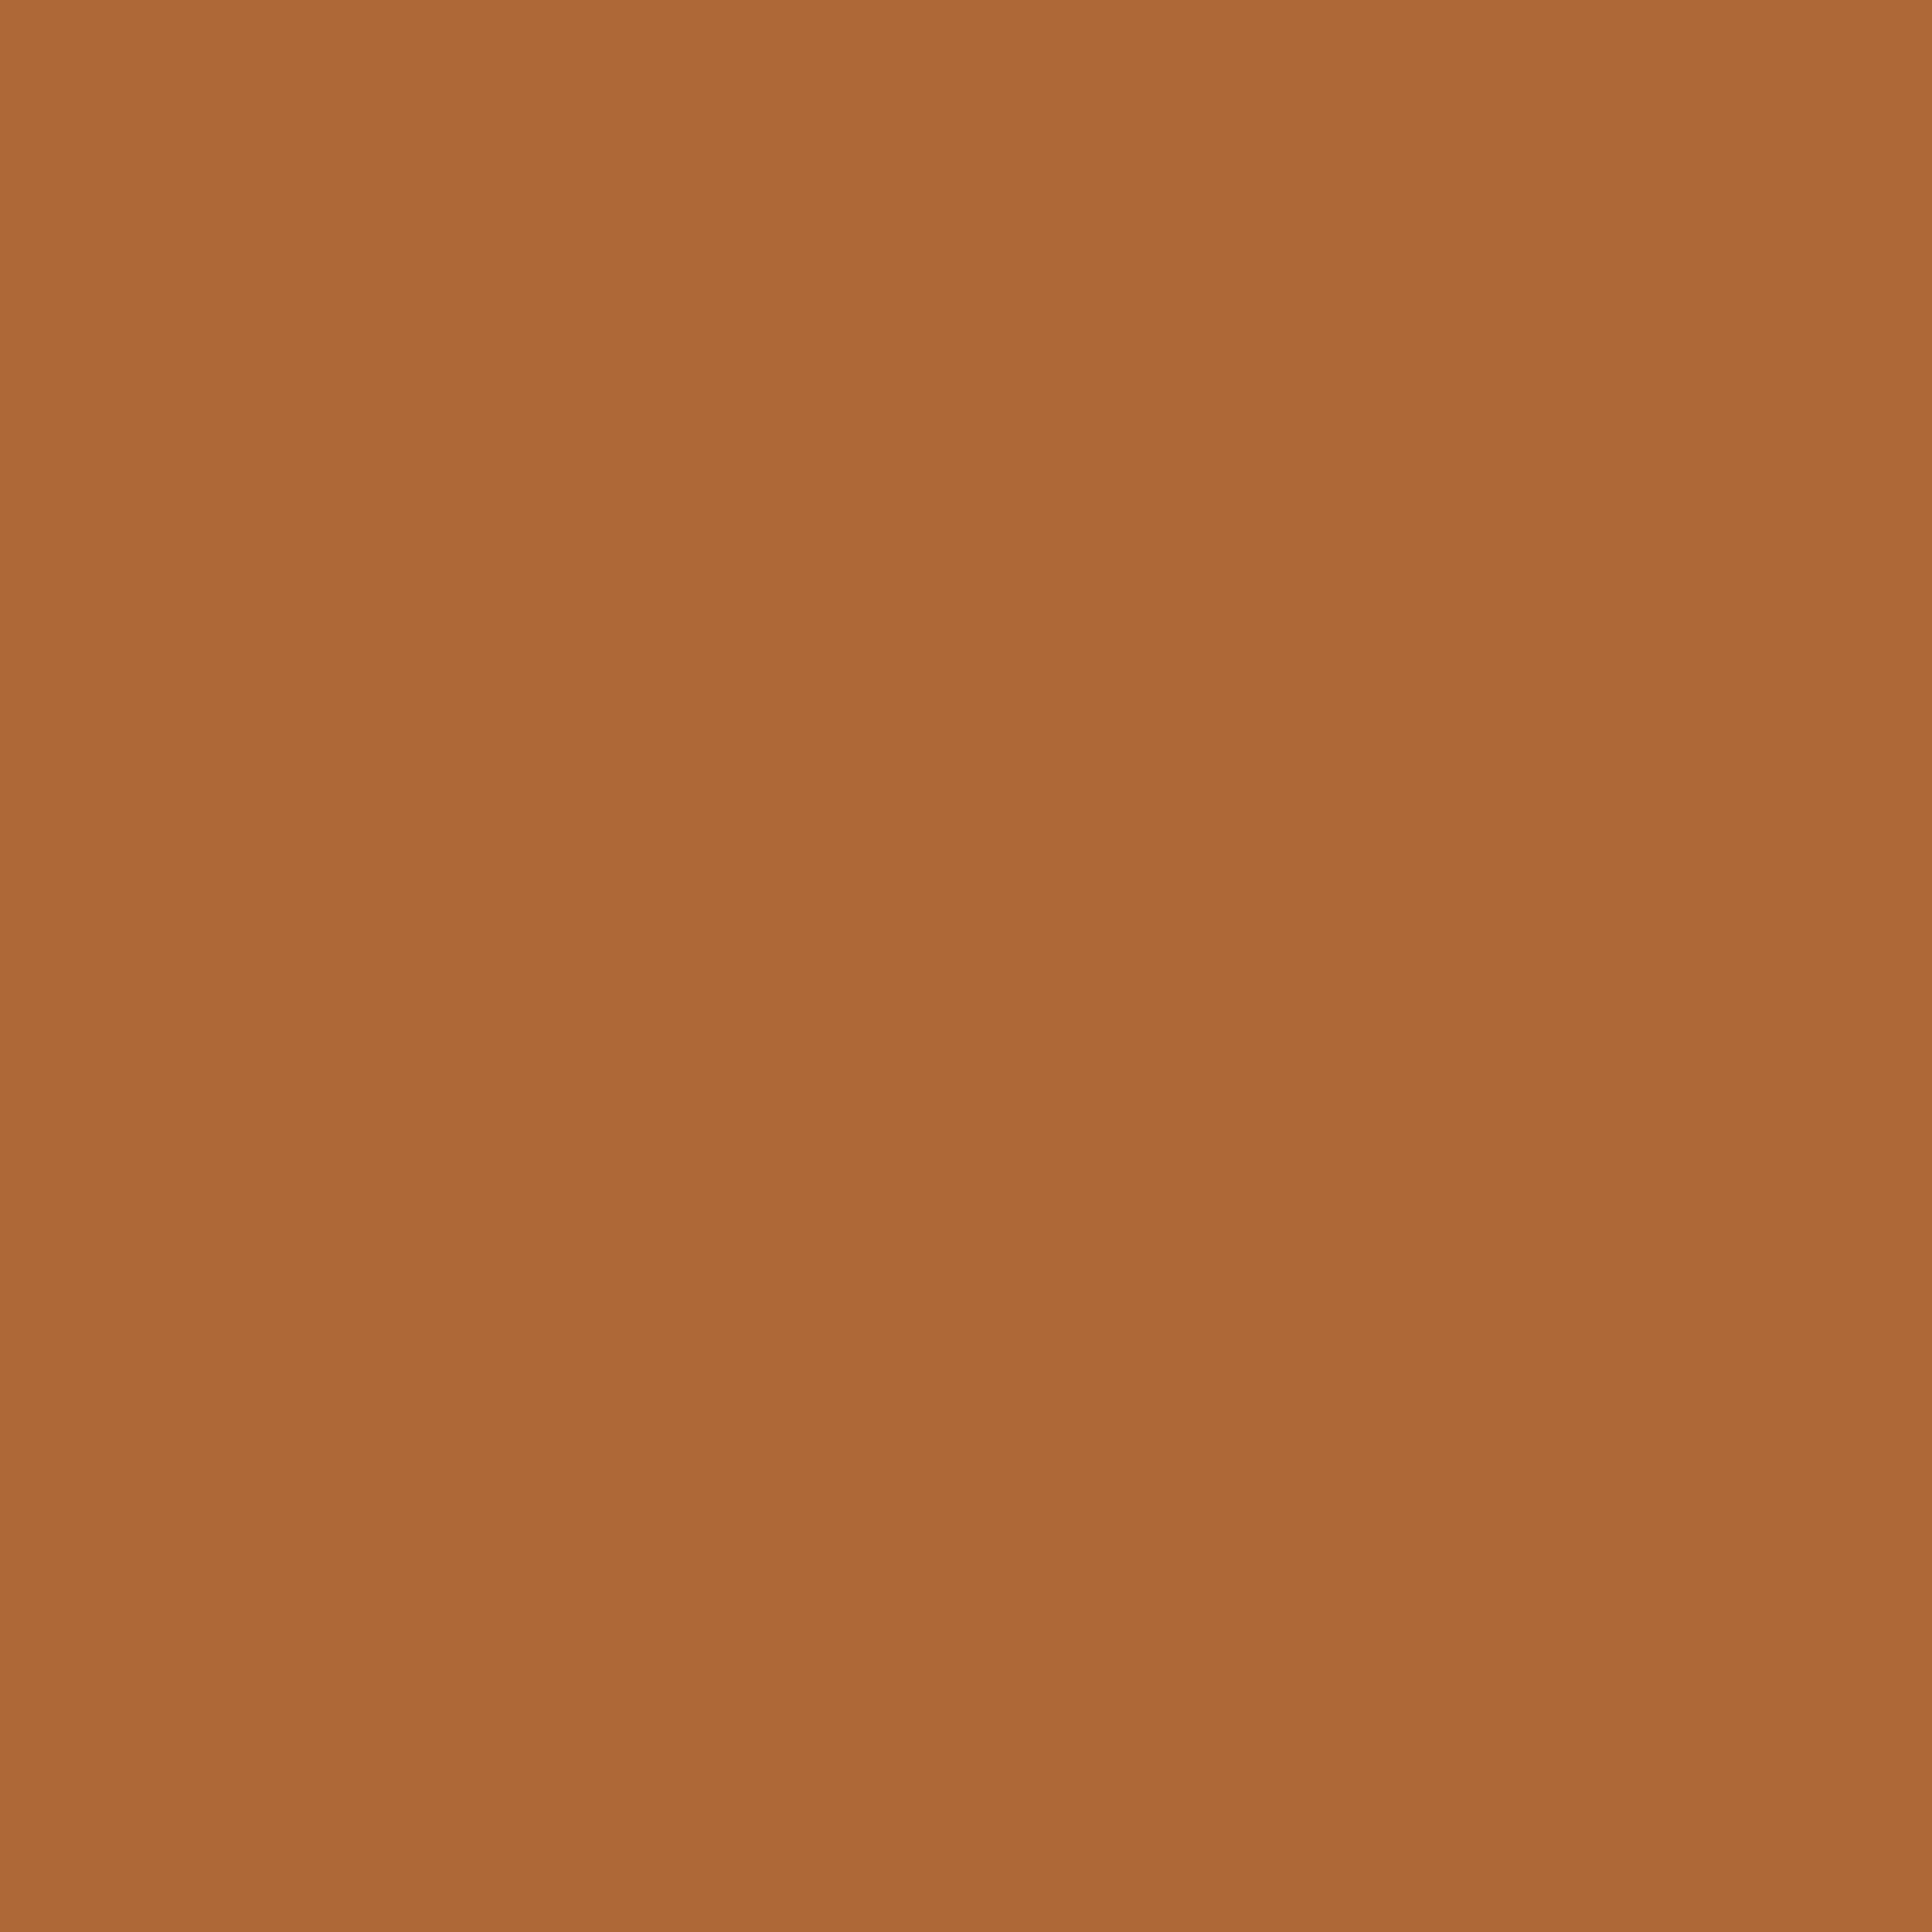 3600x3600 Windsor Tan Solid Color Background